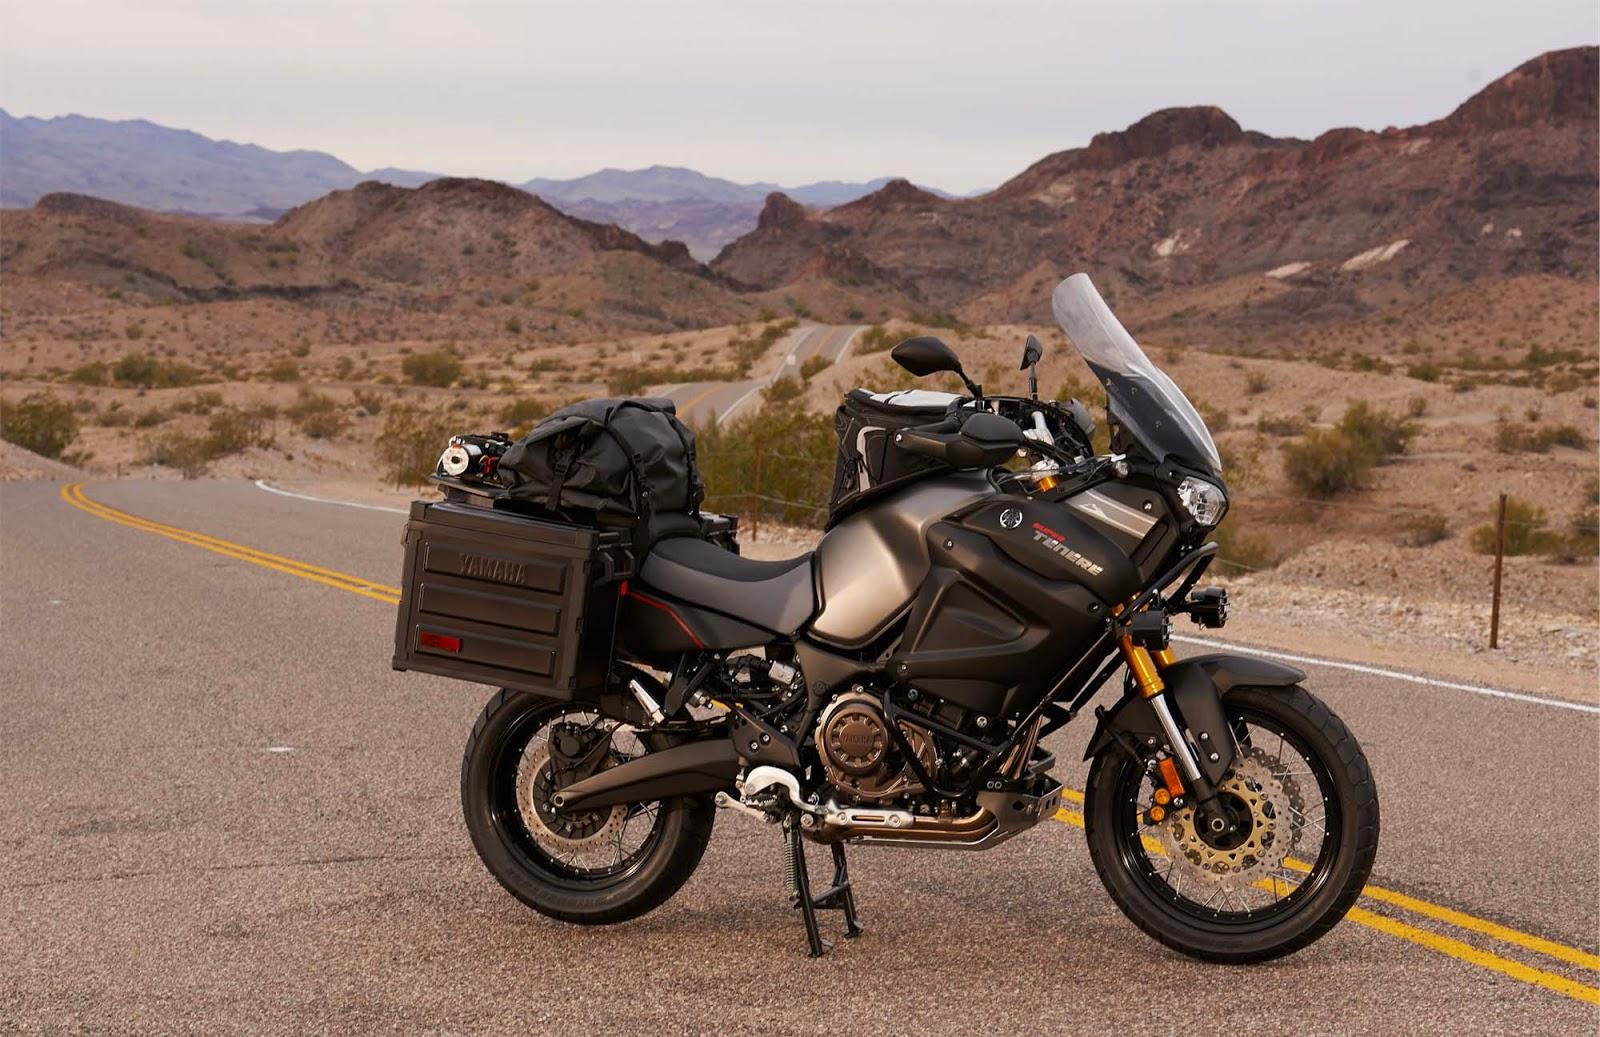 http://www.asphaltandrubber.com/bikes/2014-yamaha-super-tenere-usa/